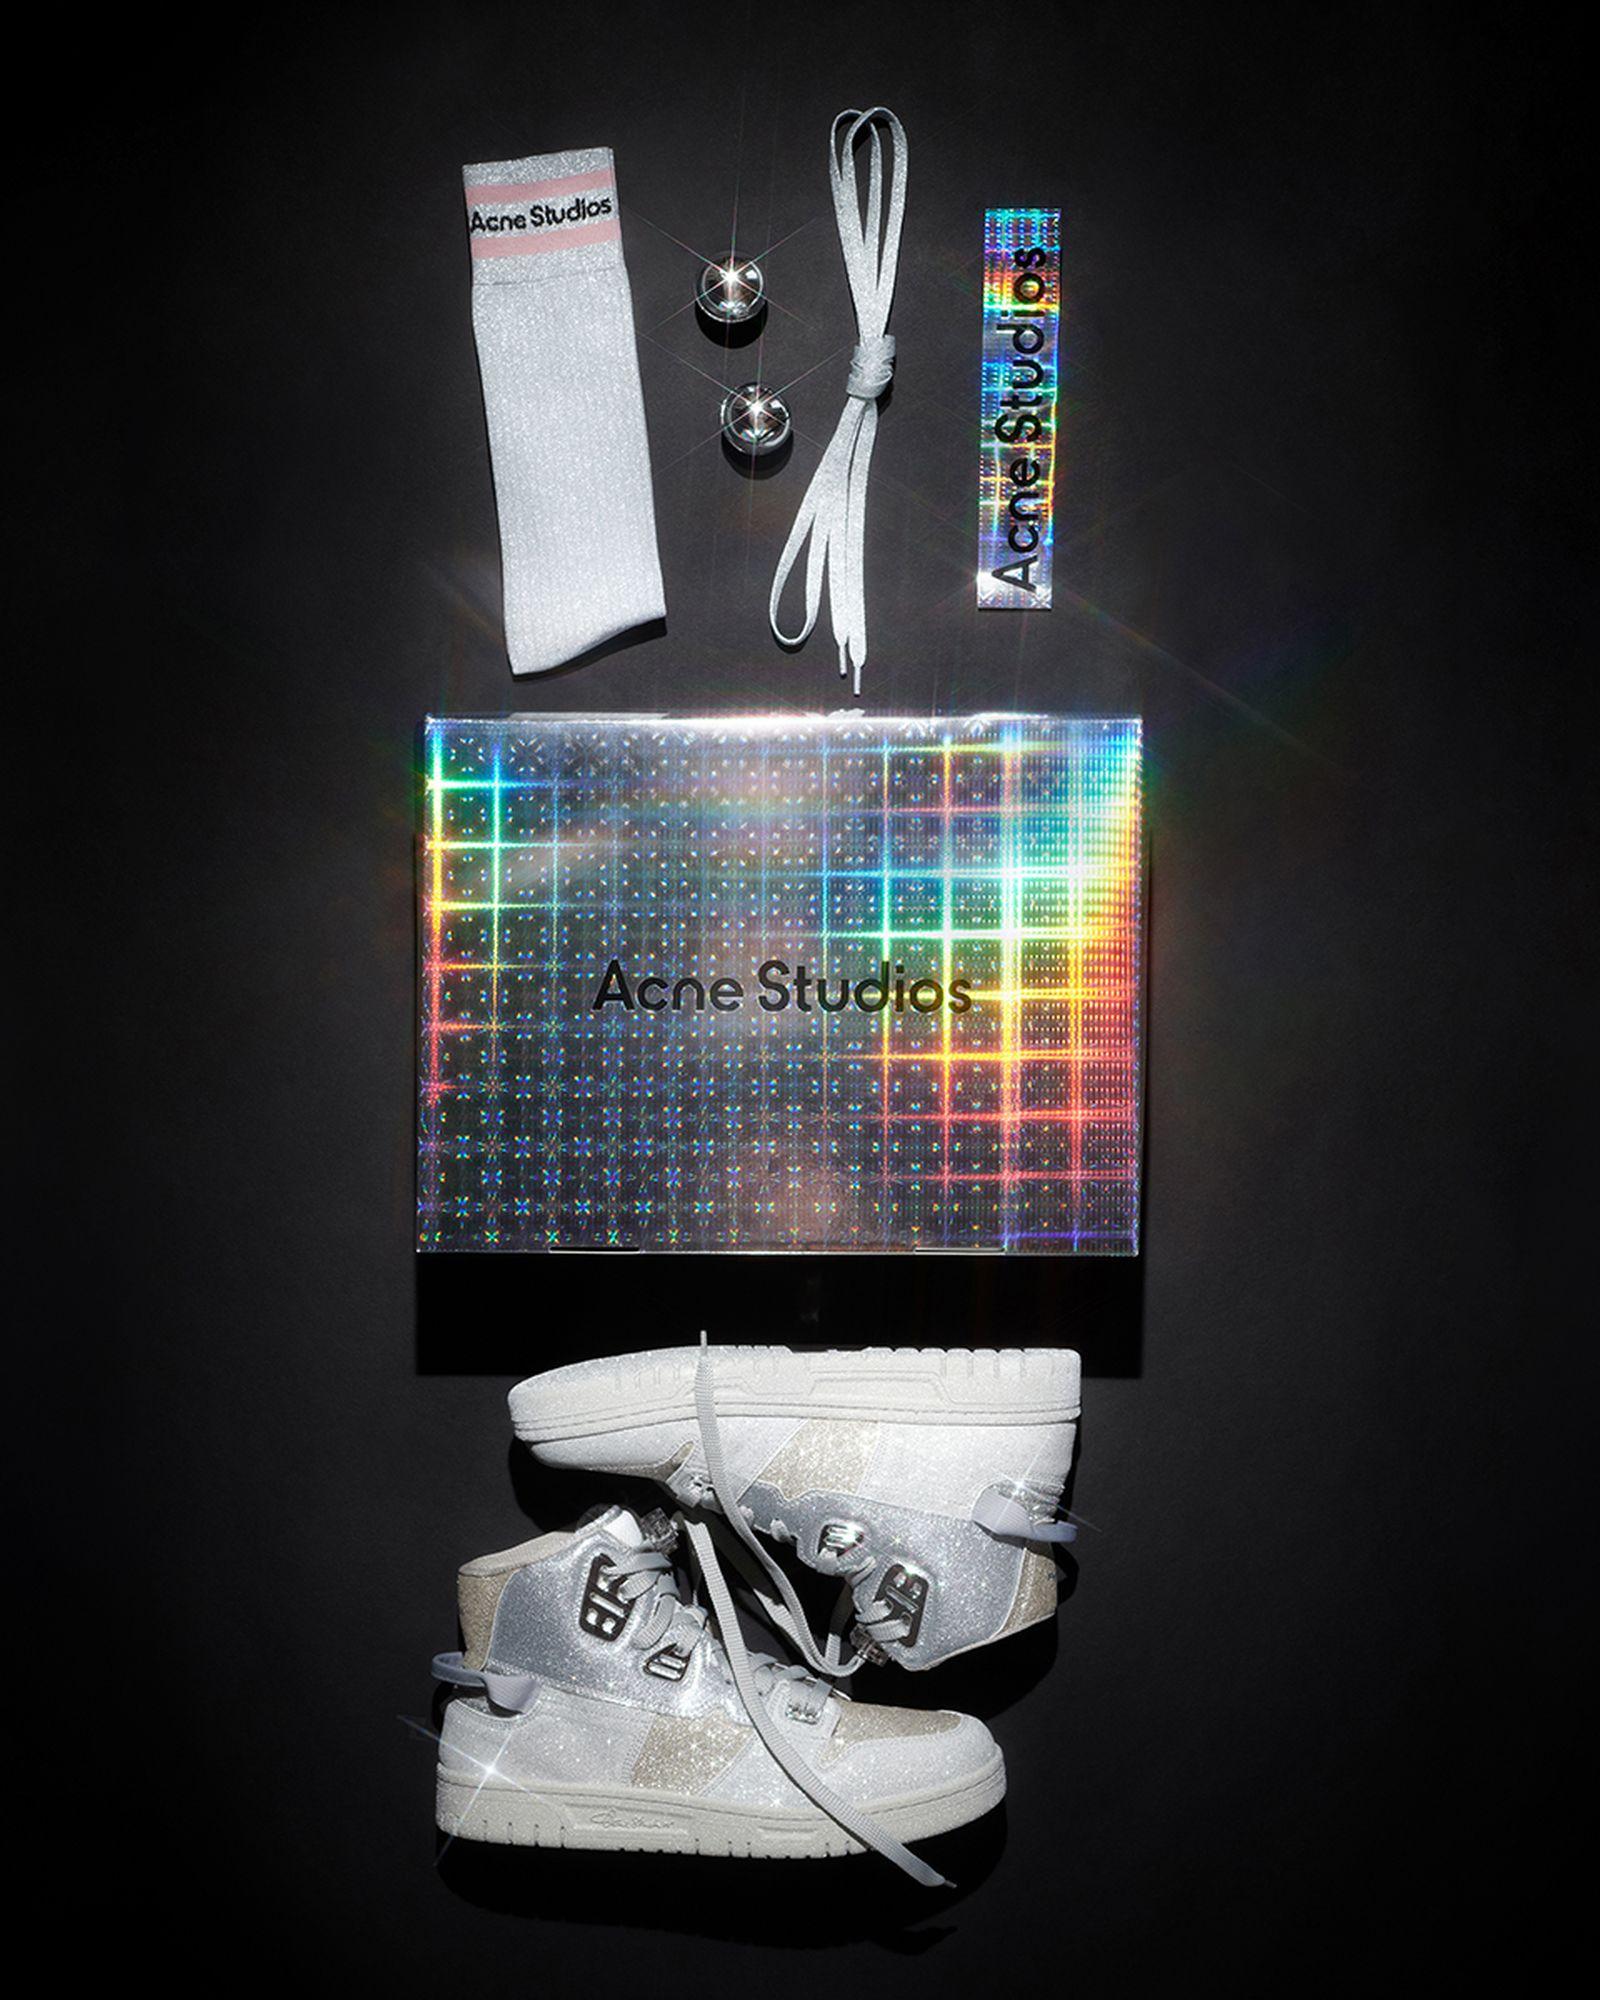 acne-studios-08sthlm-glitter-release-date-price-1-02